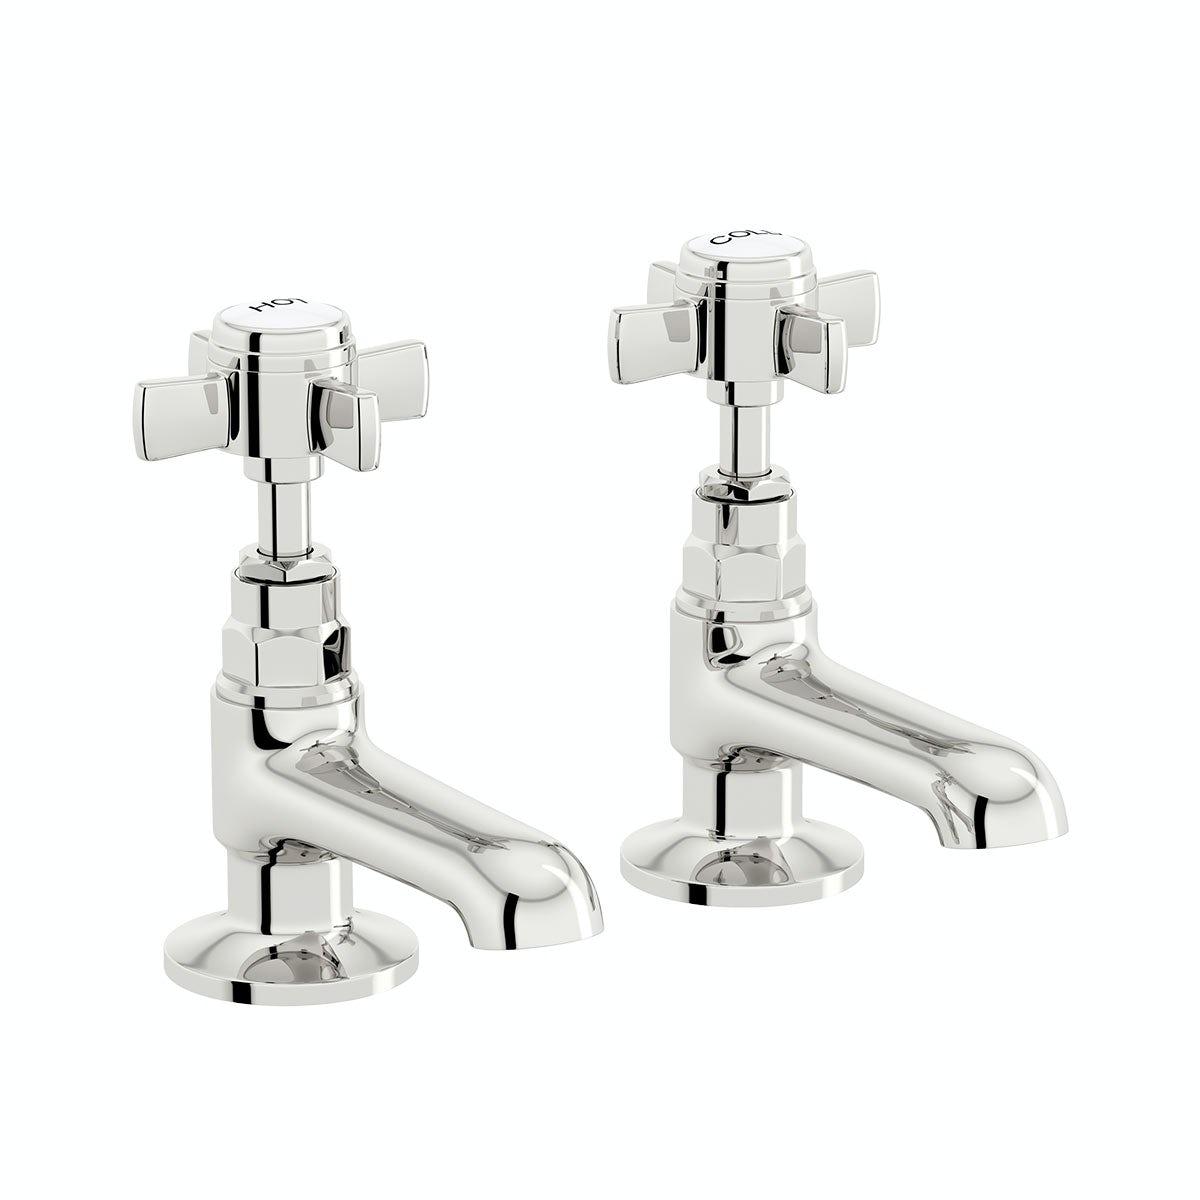 The Bath Co. Dulwich basin pillar taps offer pack